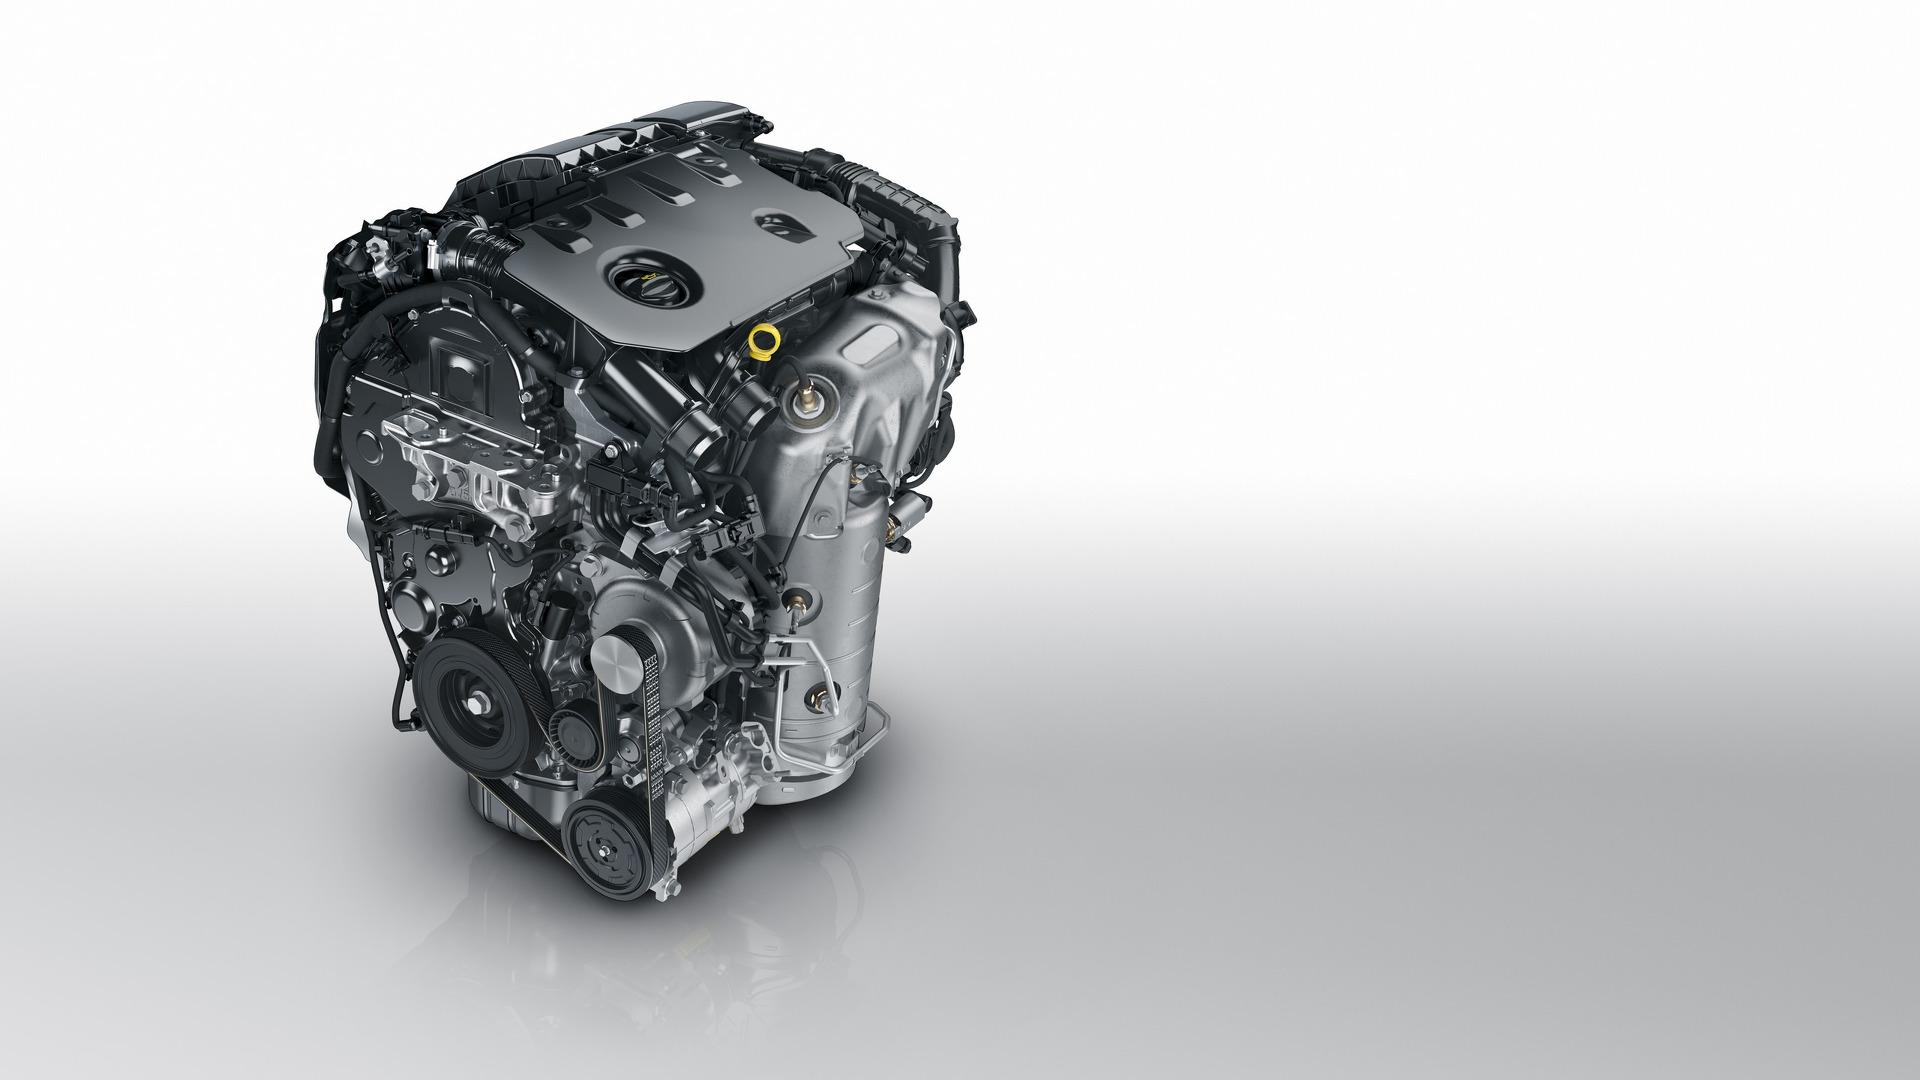 2018-peugeot-308-facelift (7)